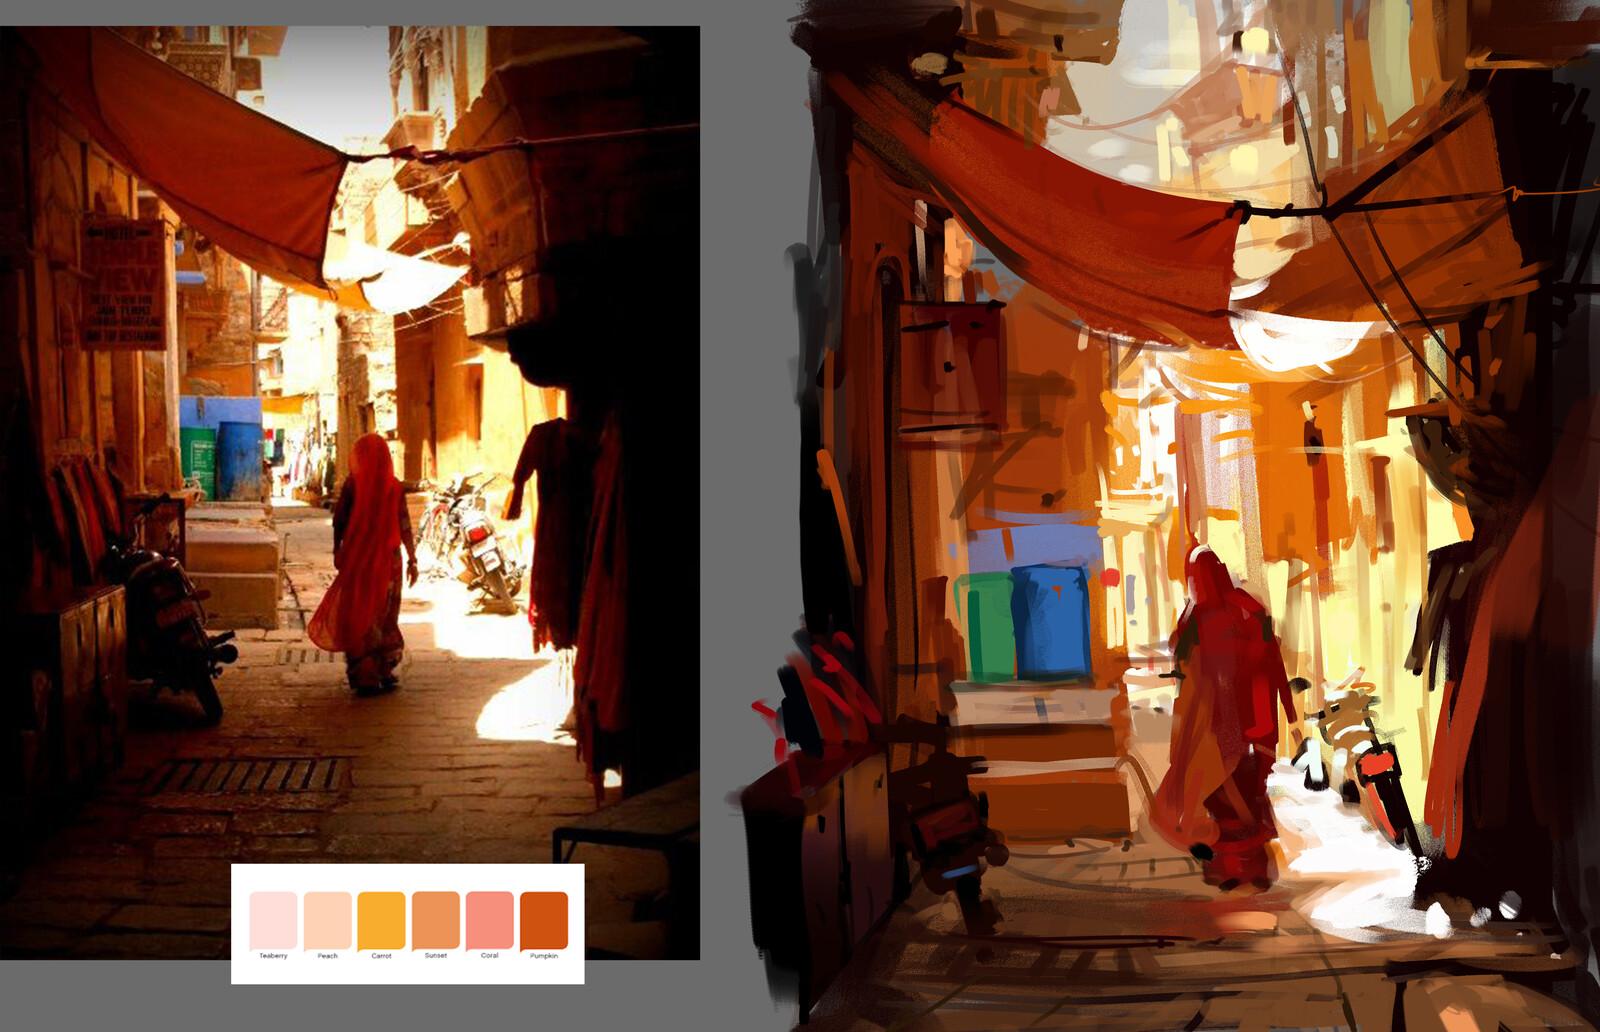 warm color study 1